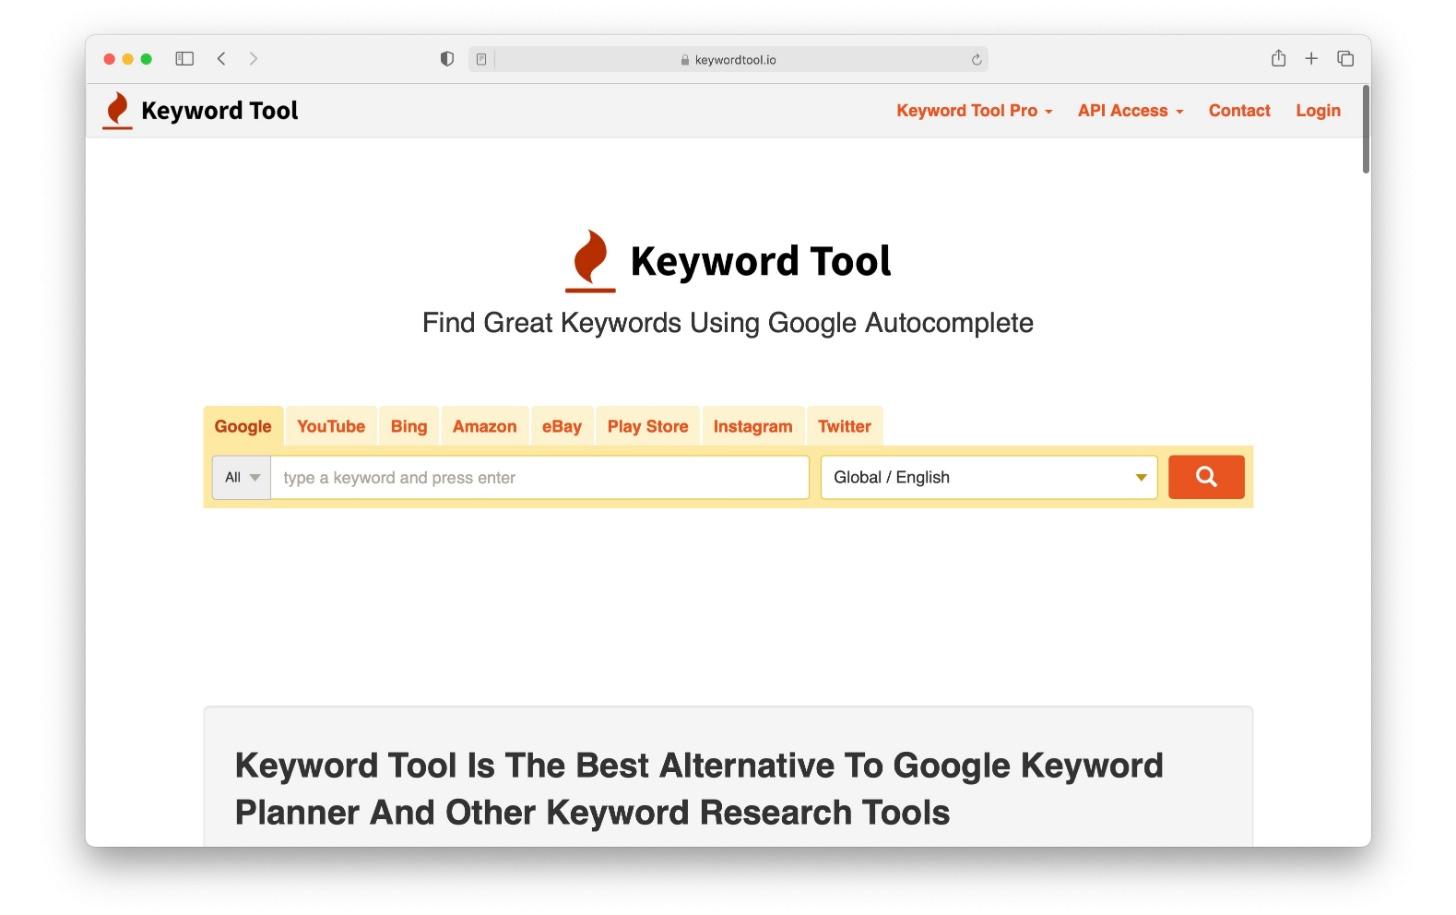 Keyword Tool is an SEO tool for keyword research